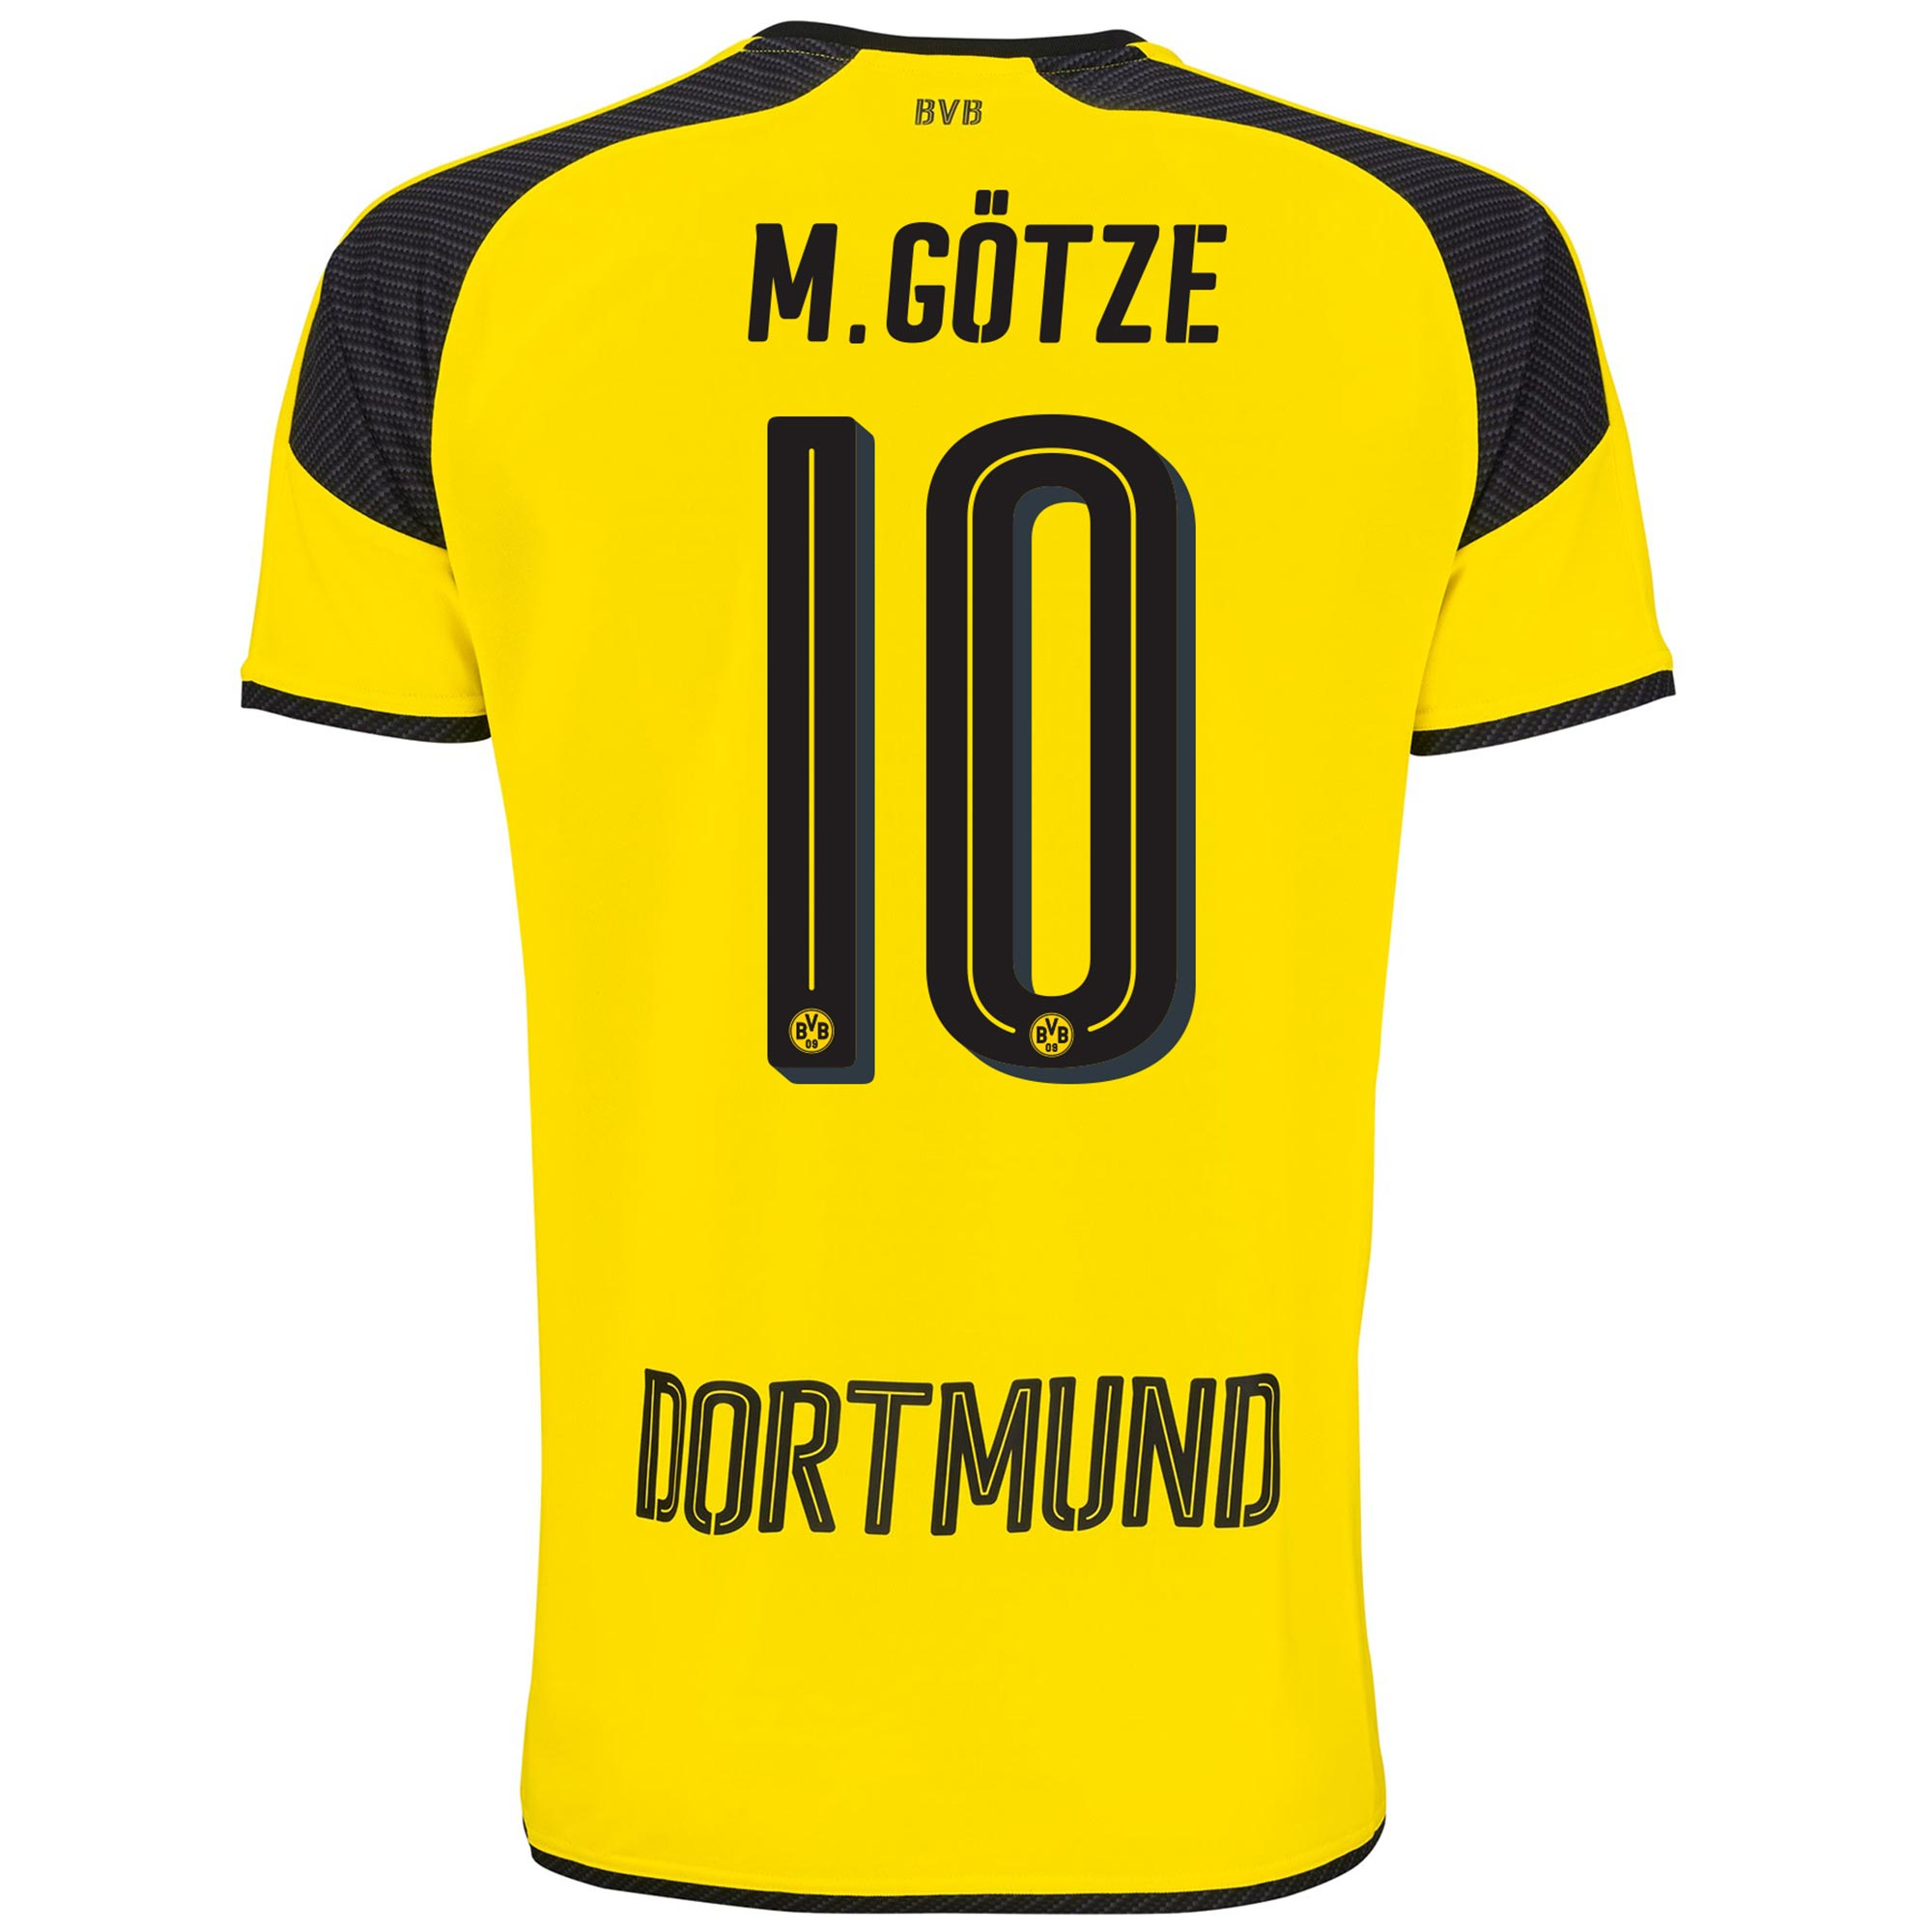 Image of BVB International Home Shirt 2016-17 with M. Götze 10 printing, N/A